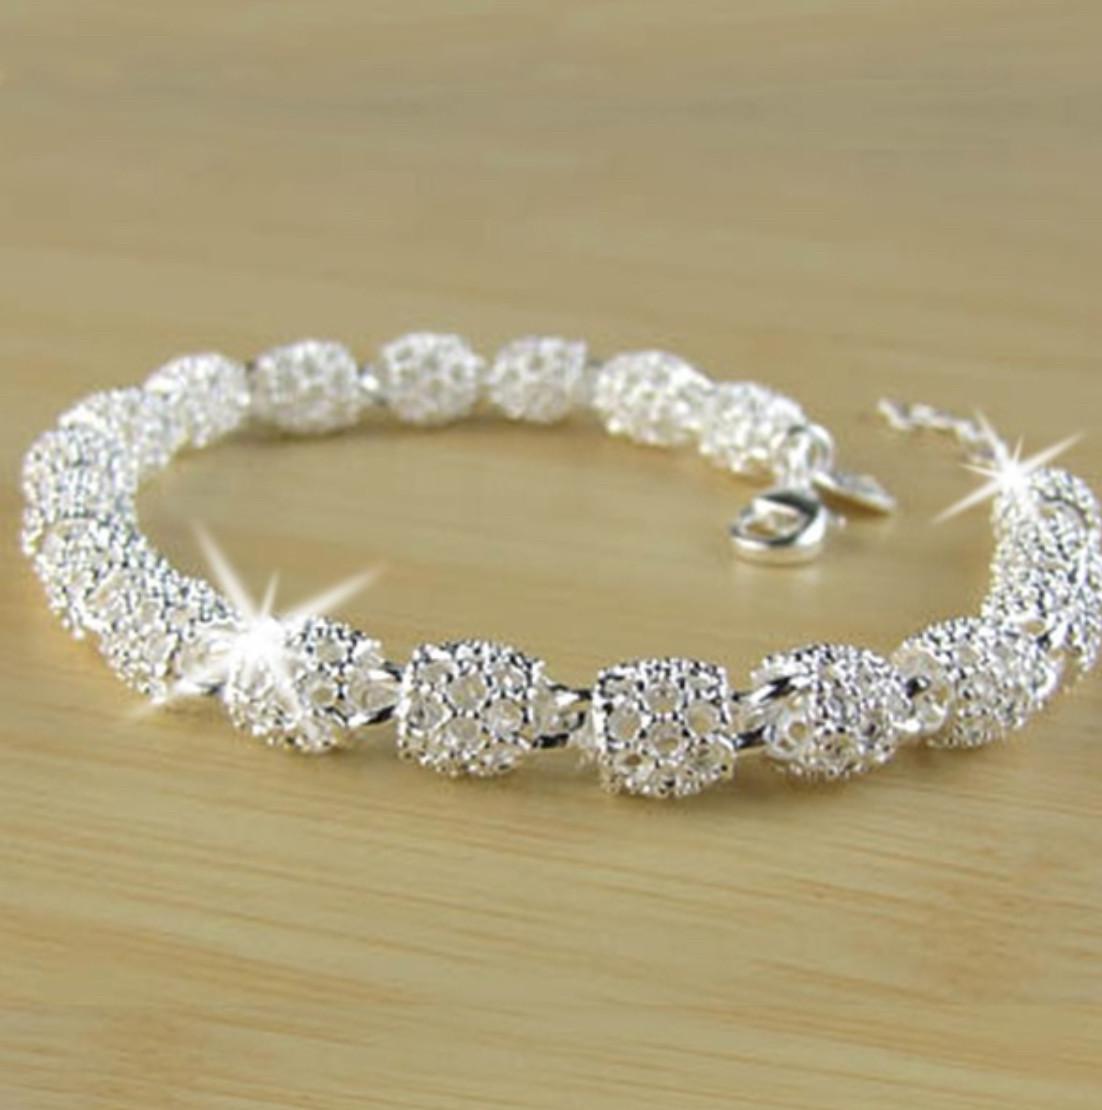 Silver fashion hollow bead chain bracelet